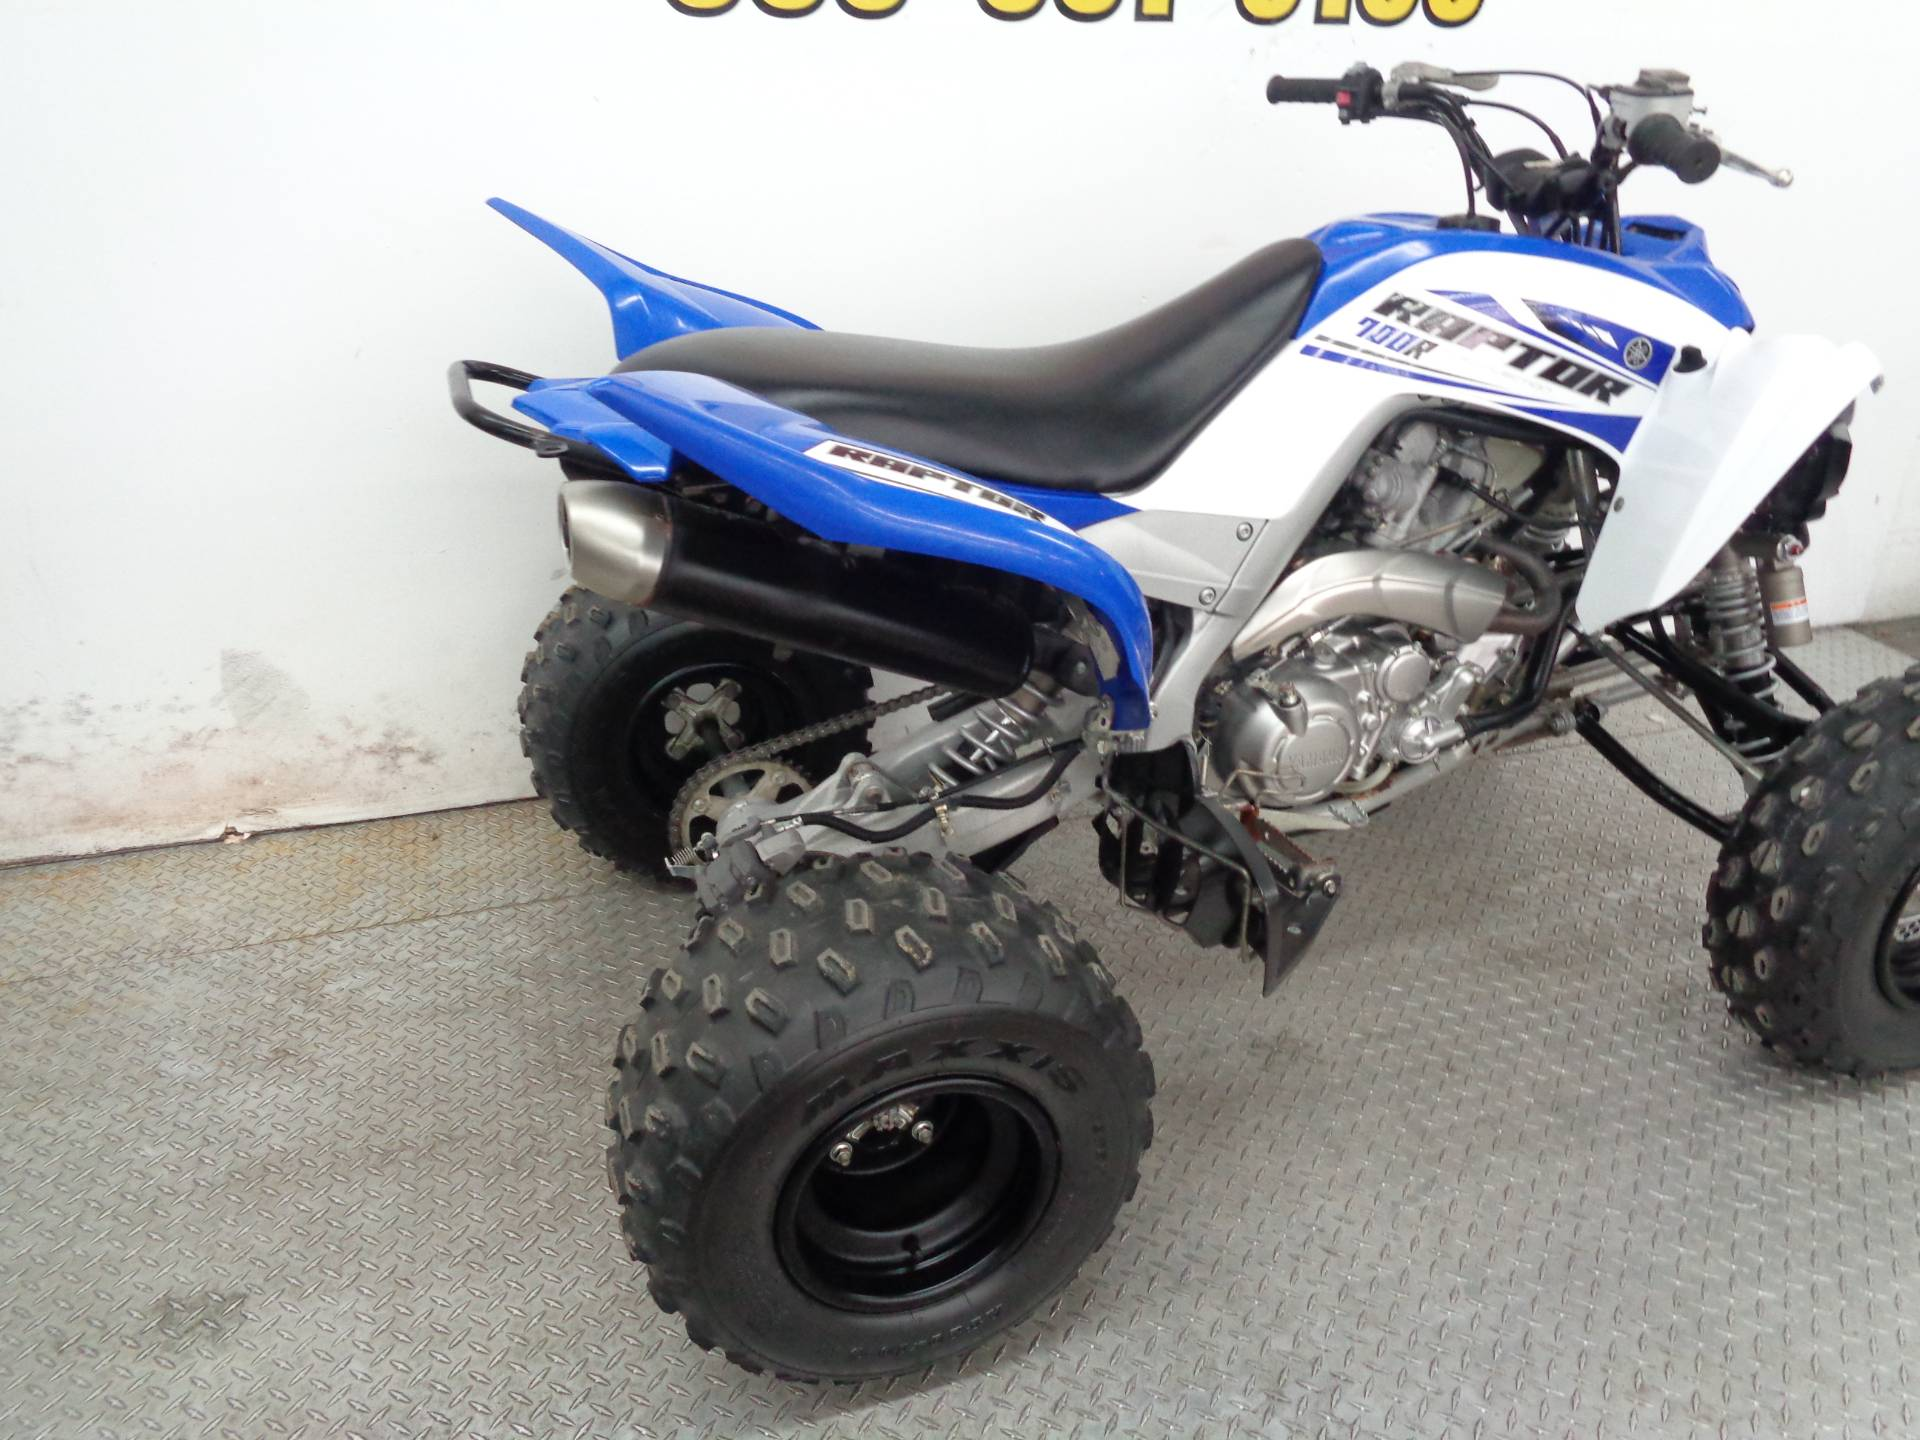 2014 Yamaha Raptor 700R 5